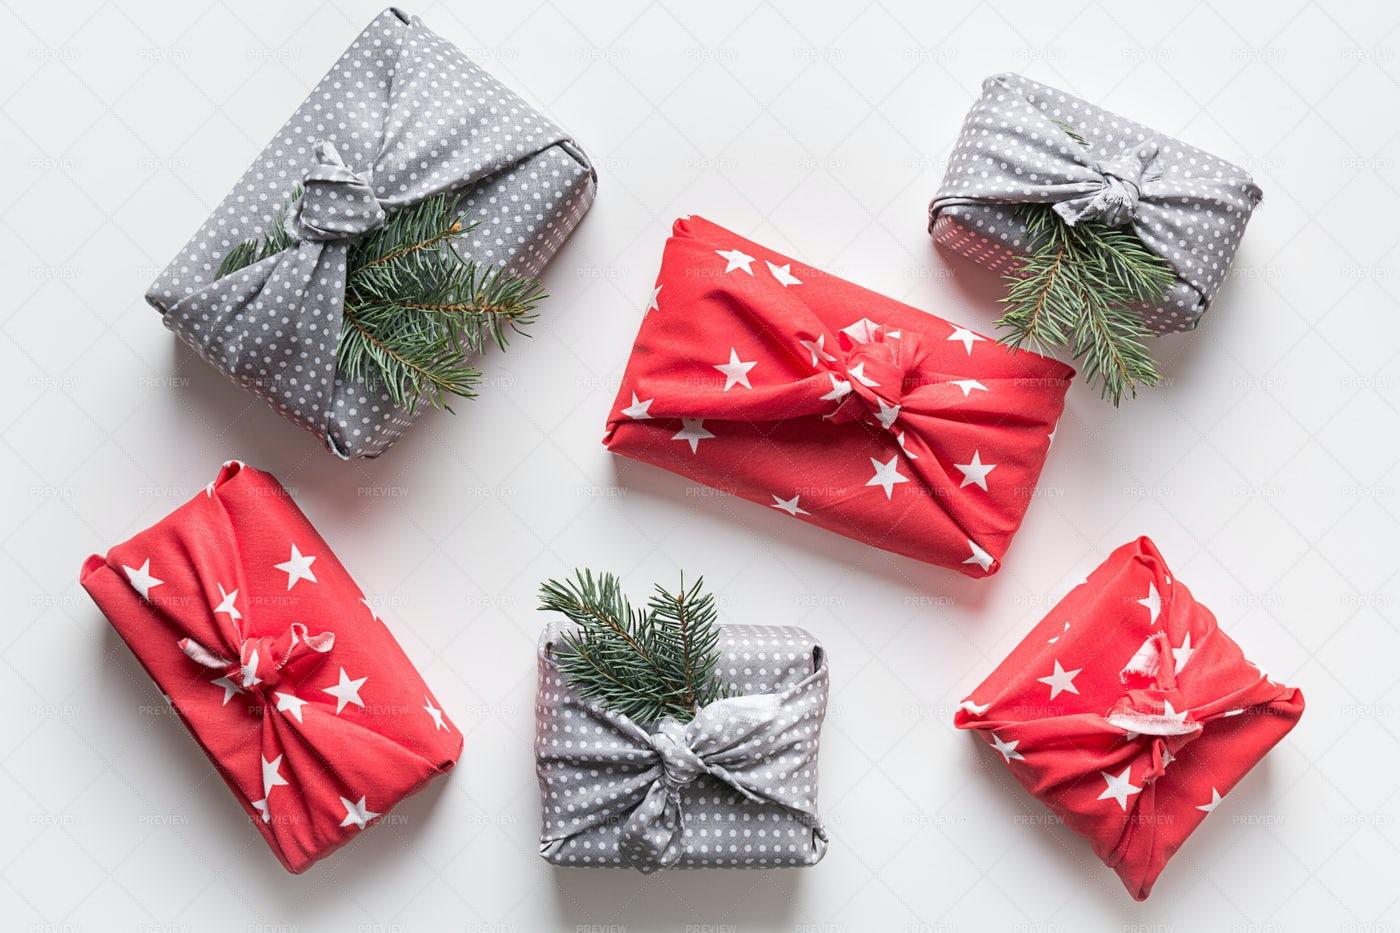 Christmas Gifts: Stock Photos